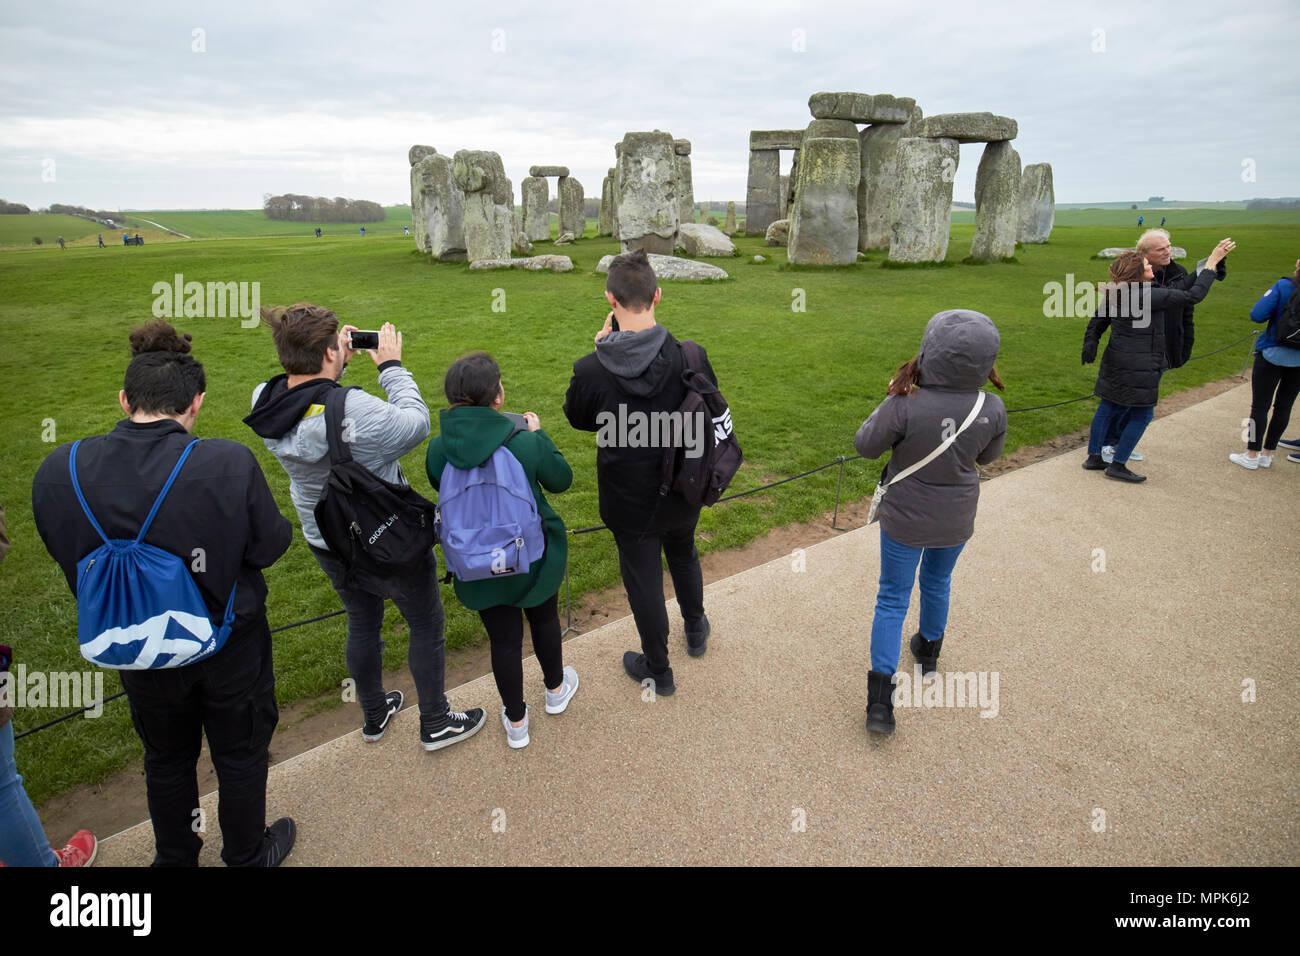 tour group of young students take photos at stonehenge wiltshire england uk - Stock Image